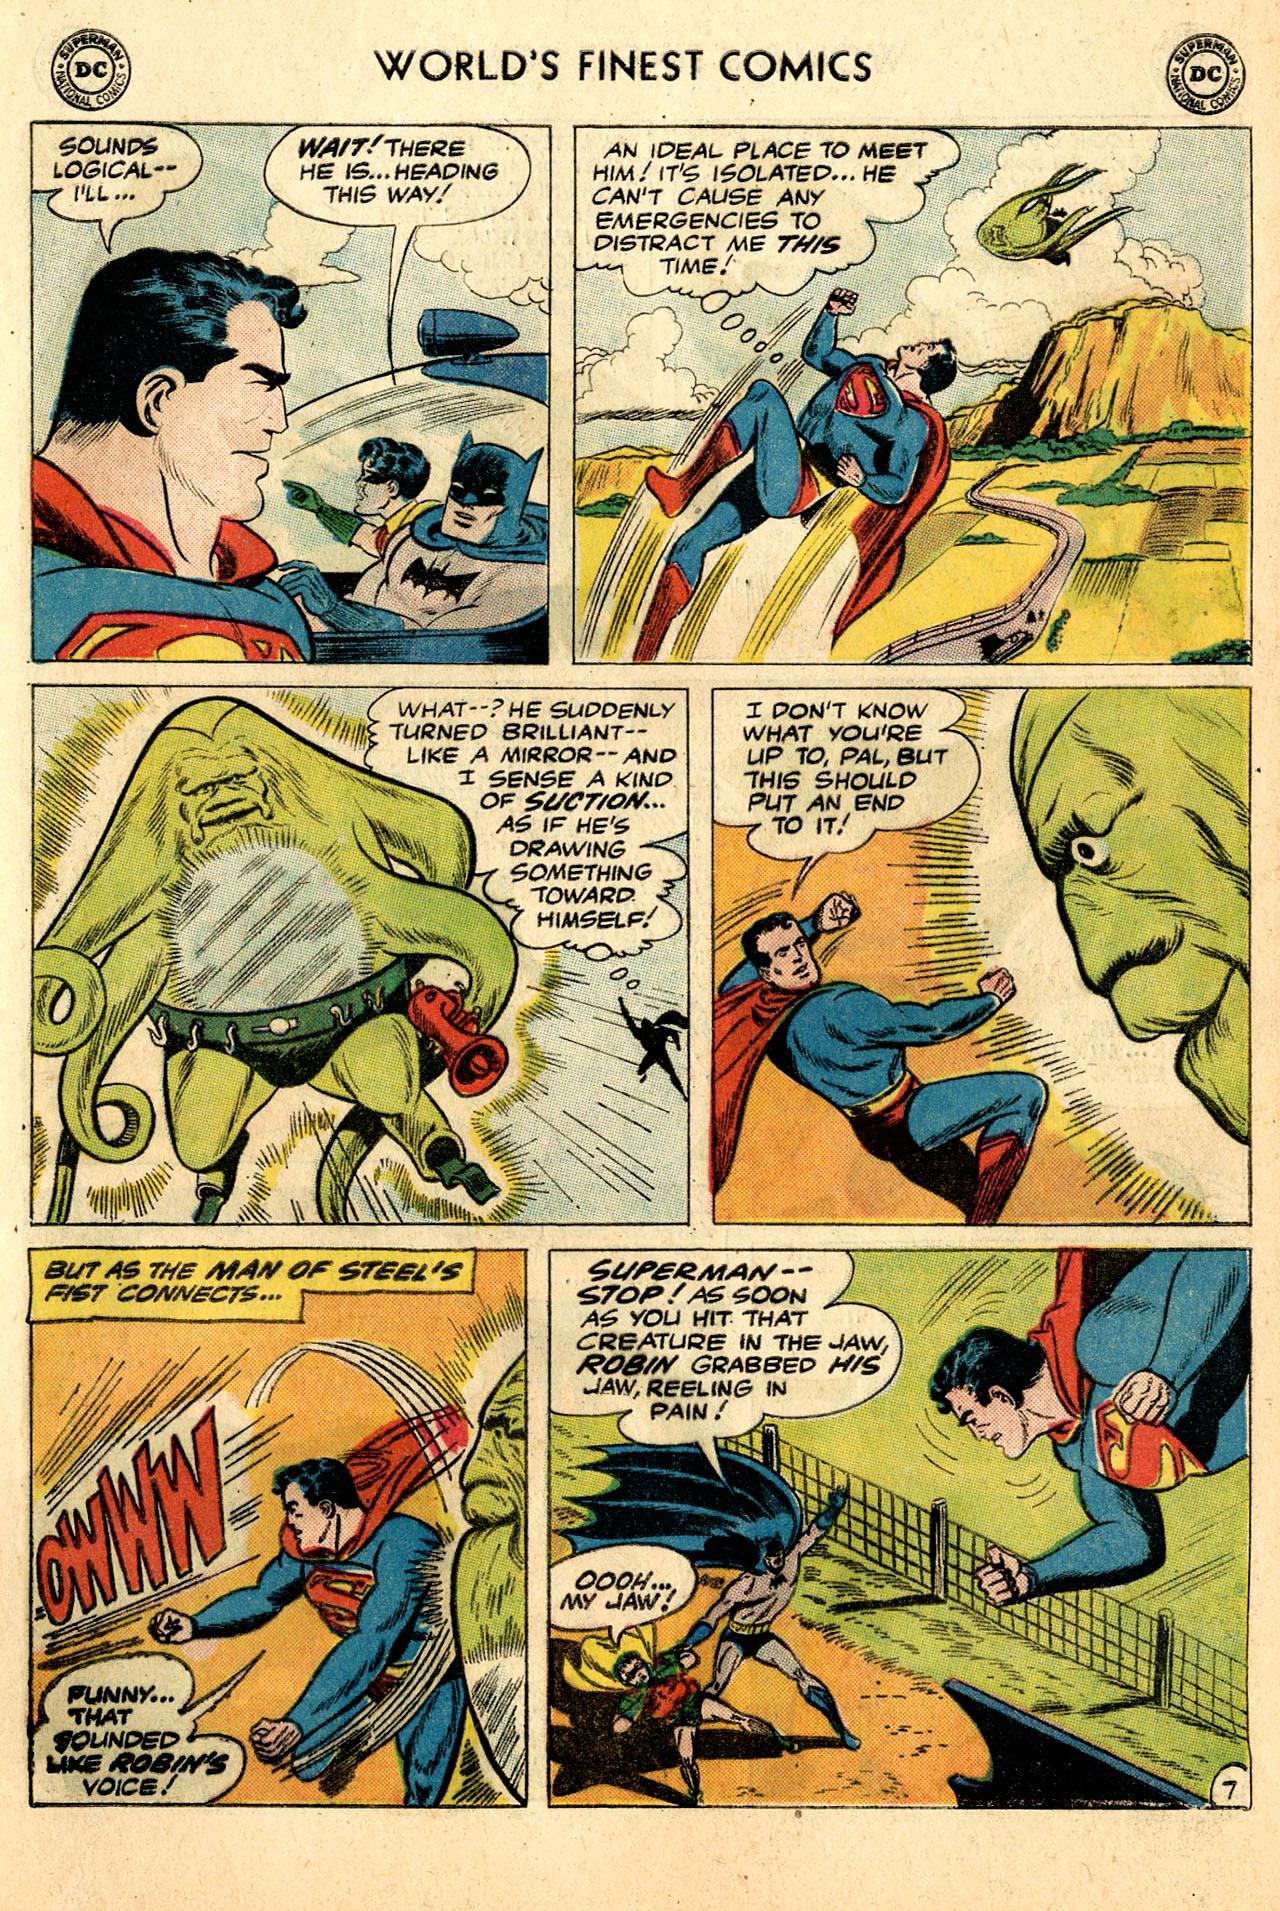 Read online World's Finest Comics comic -  Issue #110 - 9